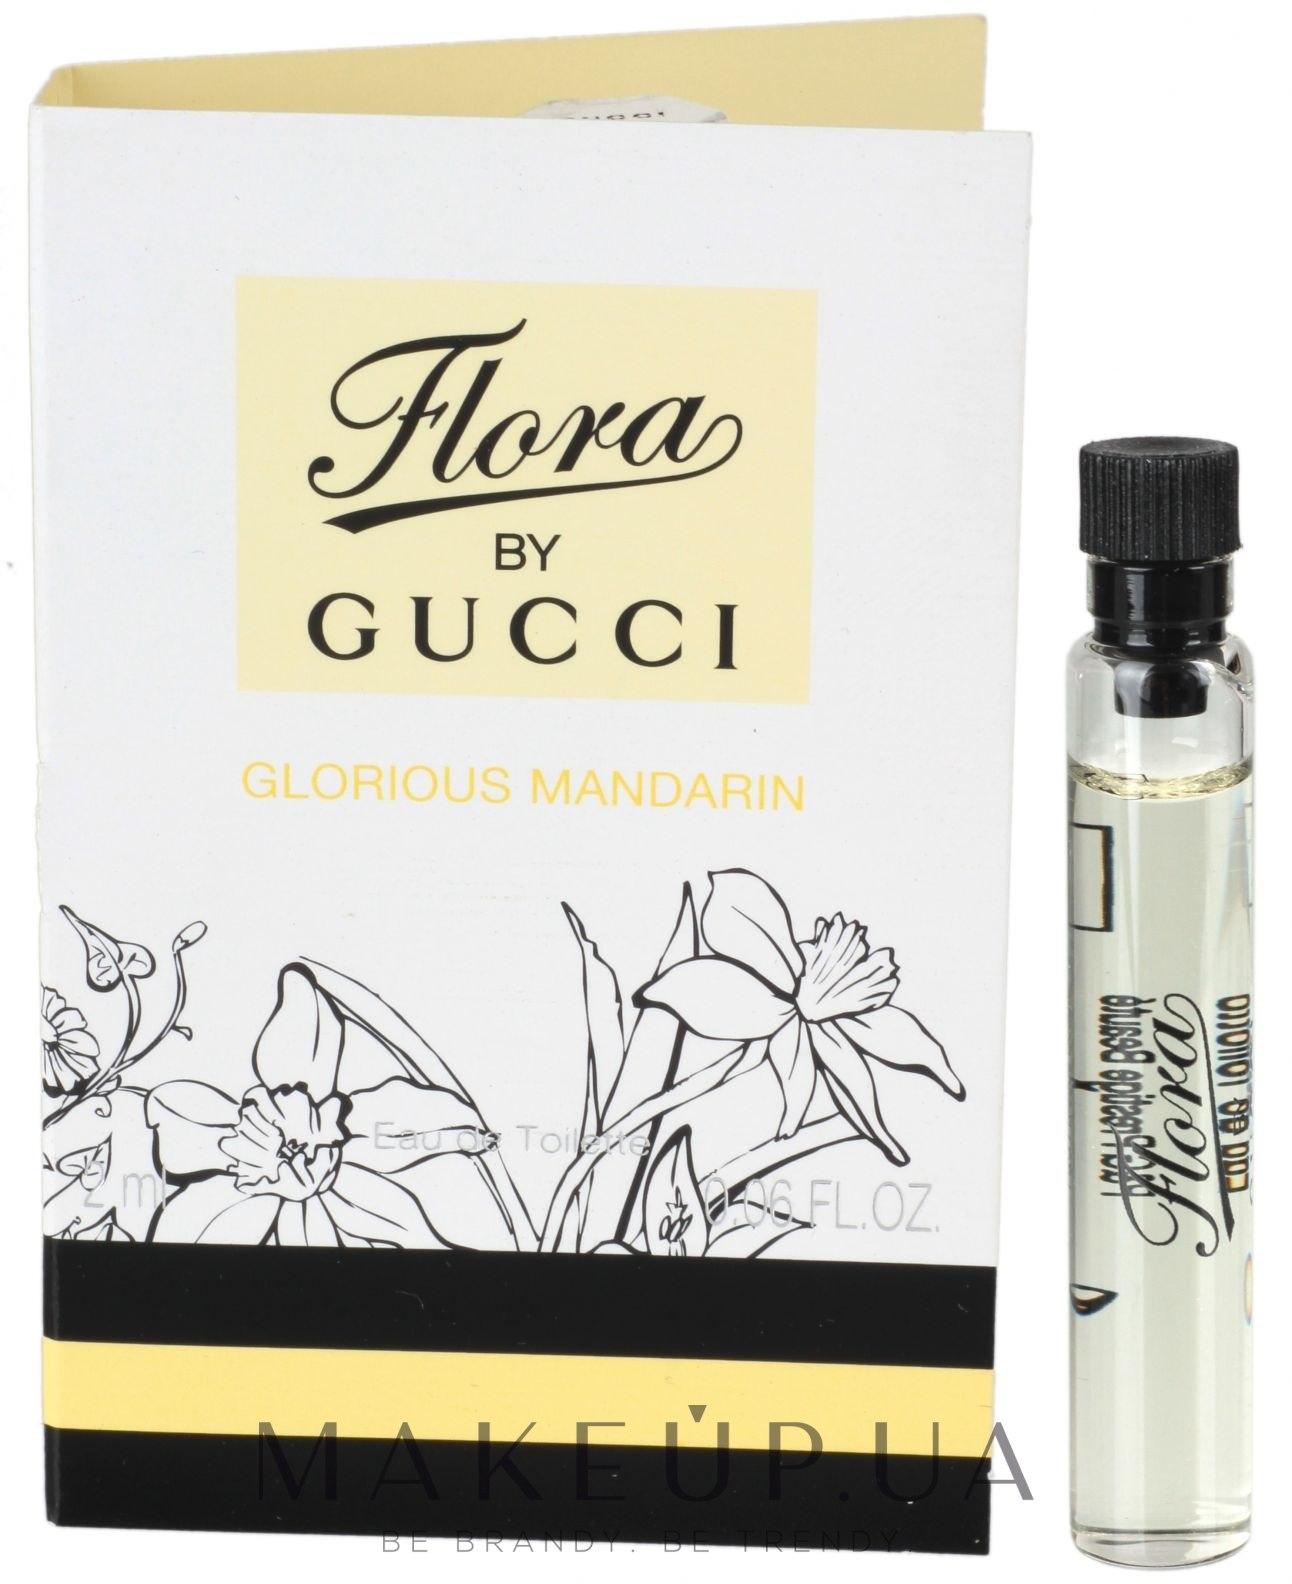 a3e8c949f564 MAKEUP   Отзывы о Gucci Flora by Gucci Glorious Mandarin - Туалетная вода  (пробник)